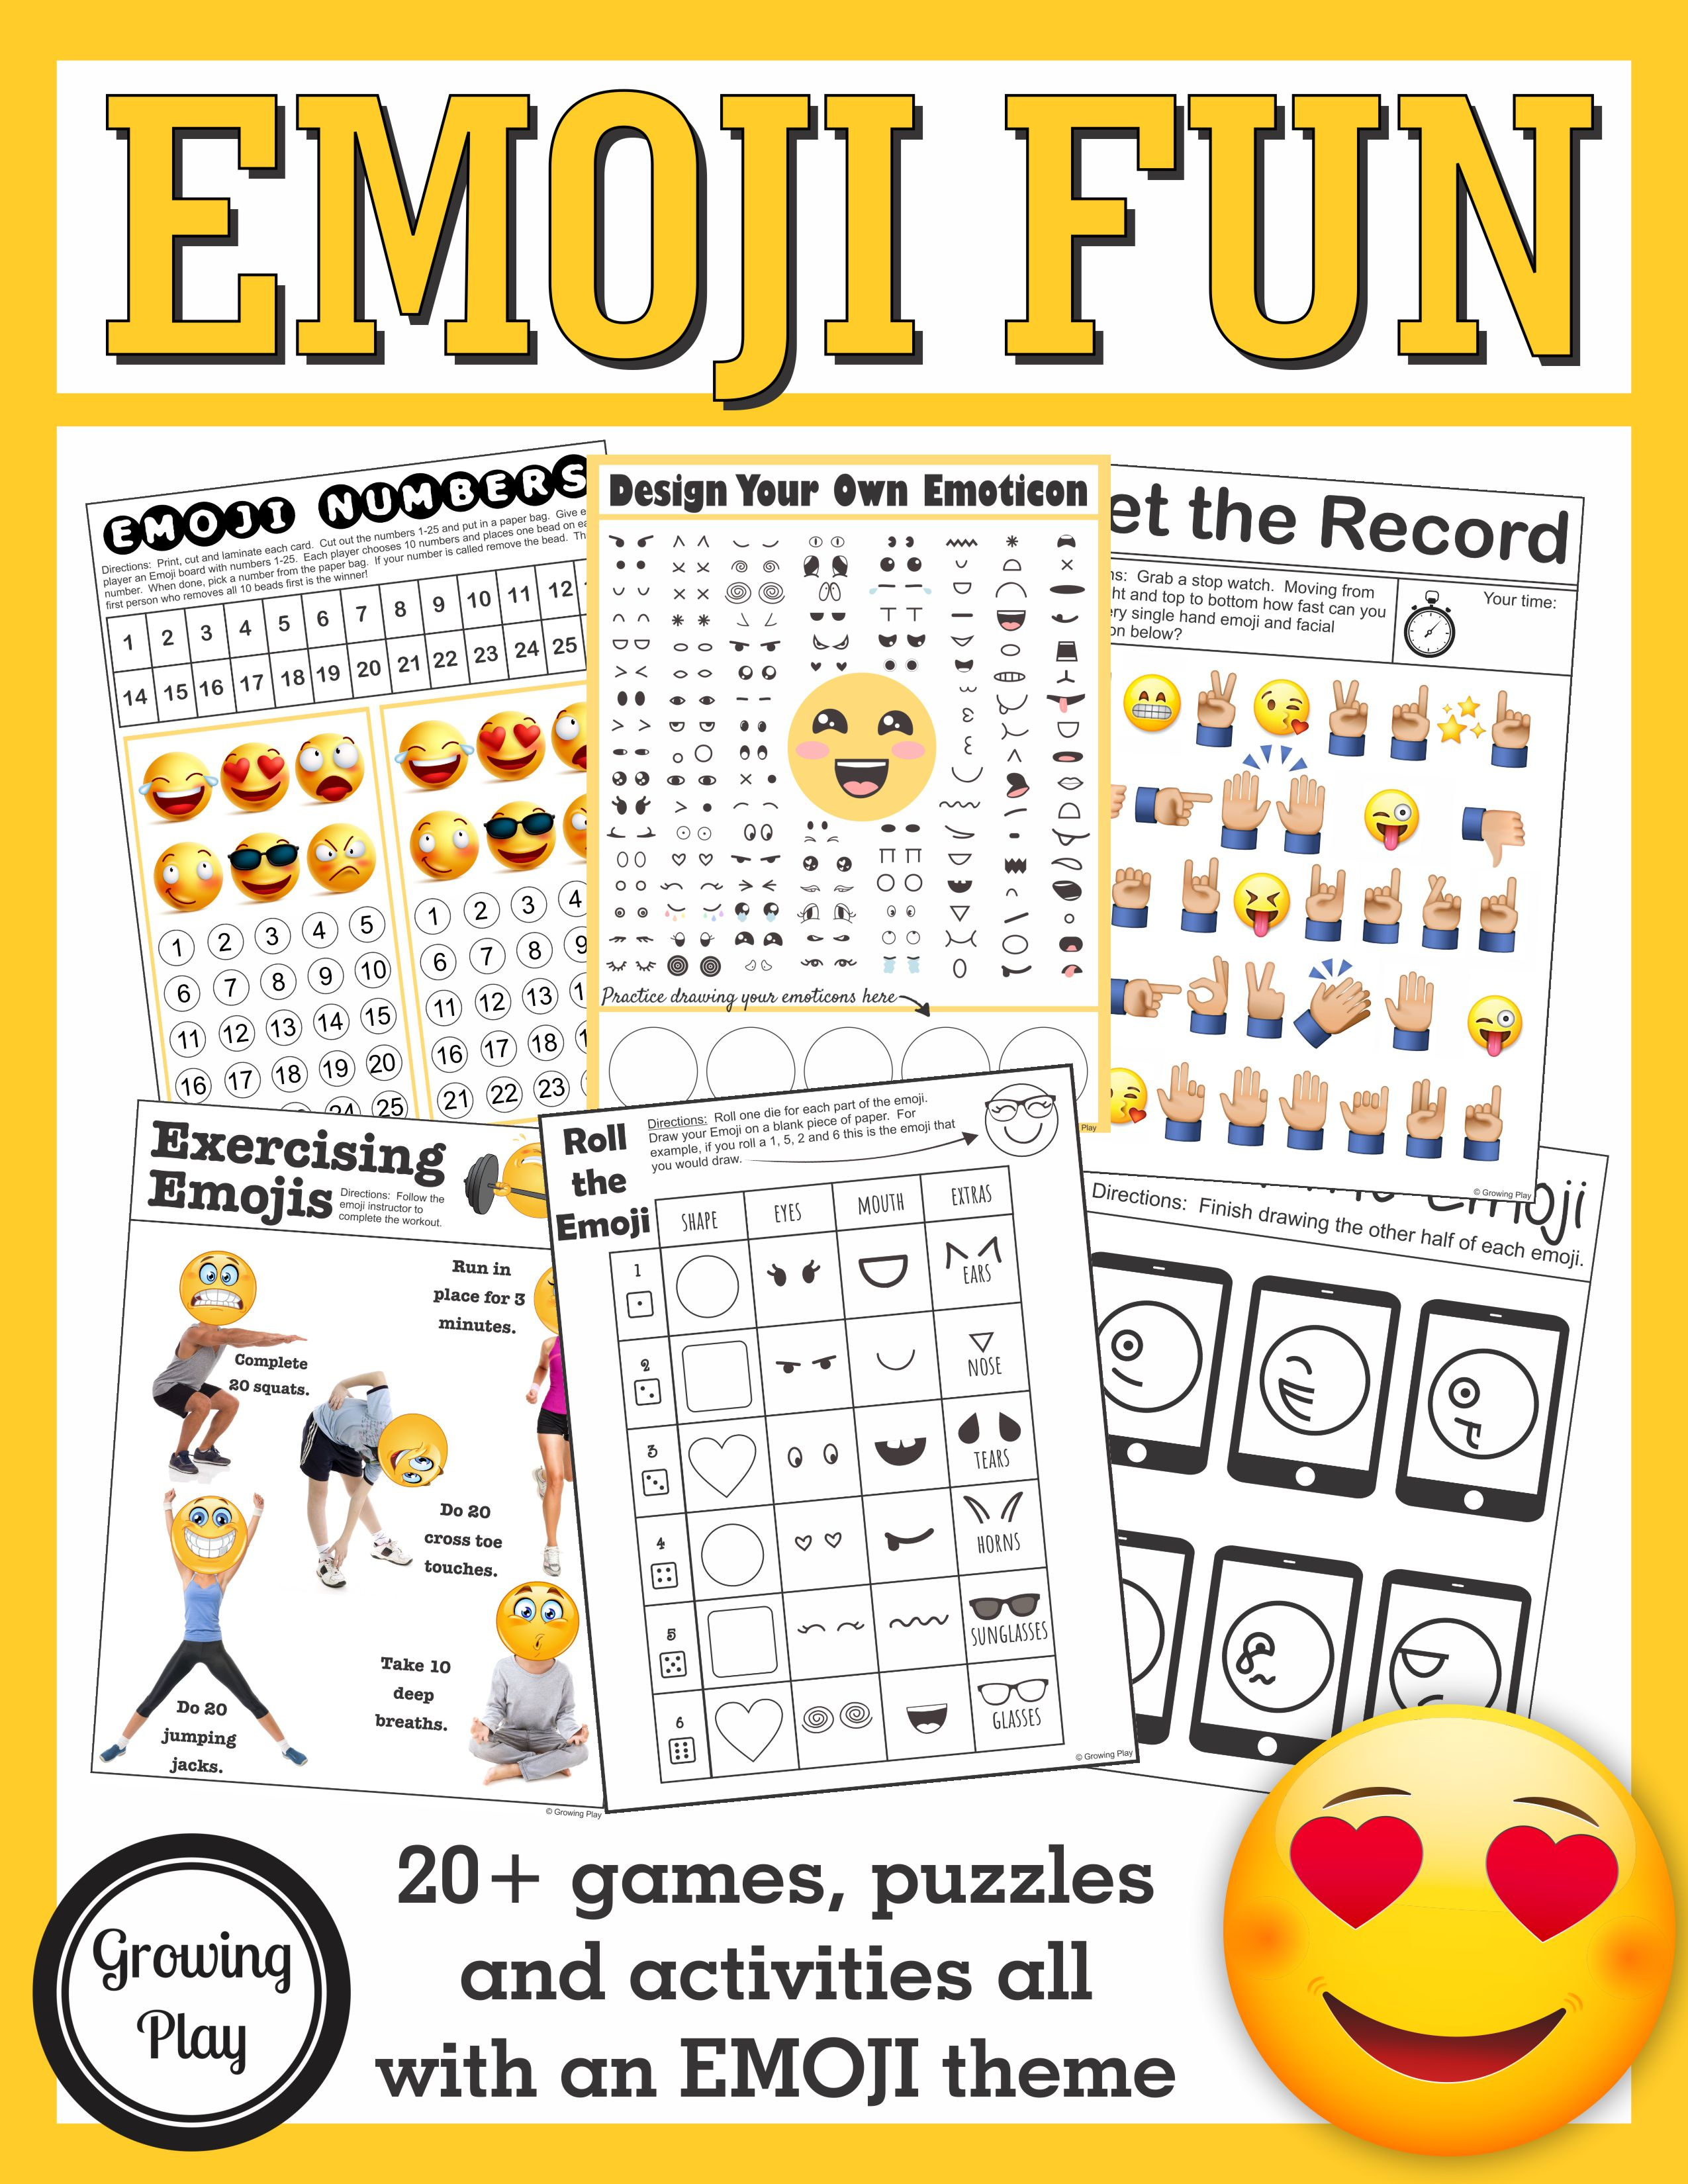 Emoji Games And Puzzles Packet Emoji Birthday Parties - Growing Play - Printable Puzzle Packet